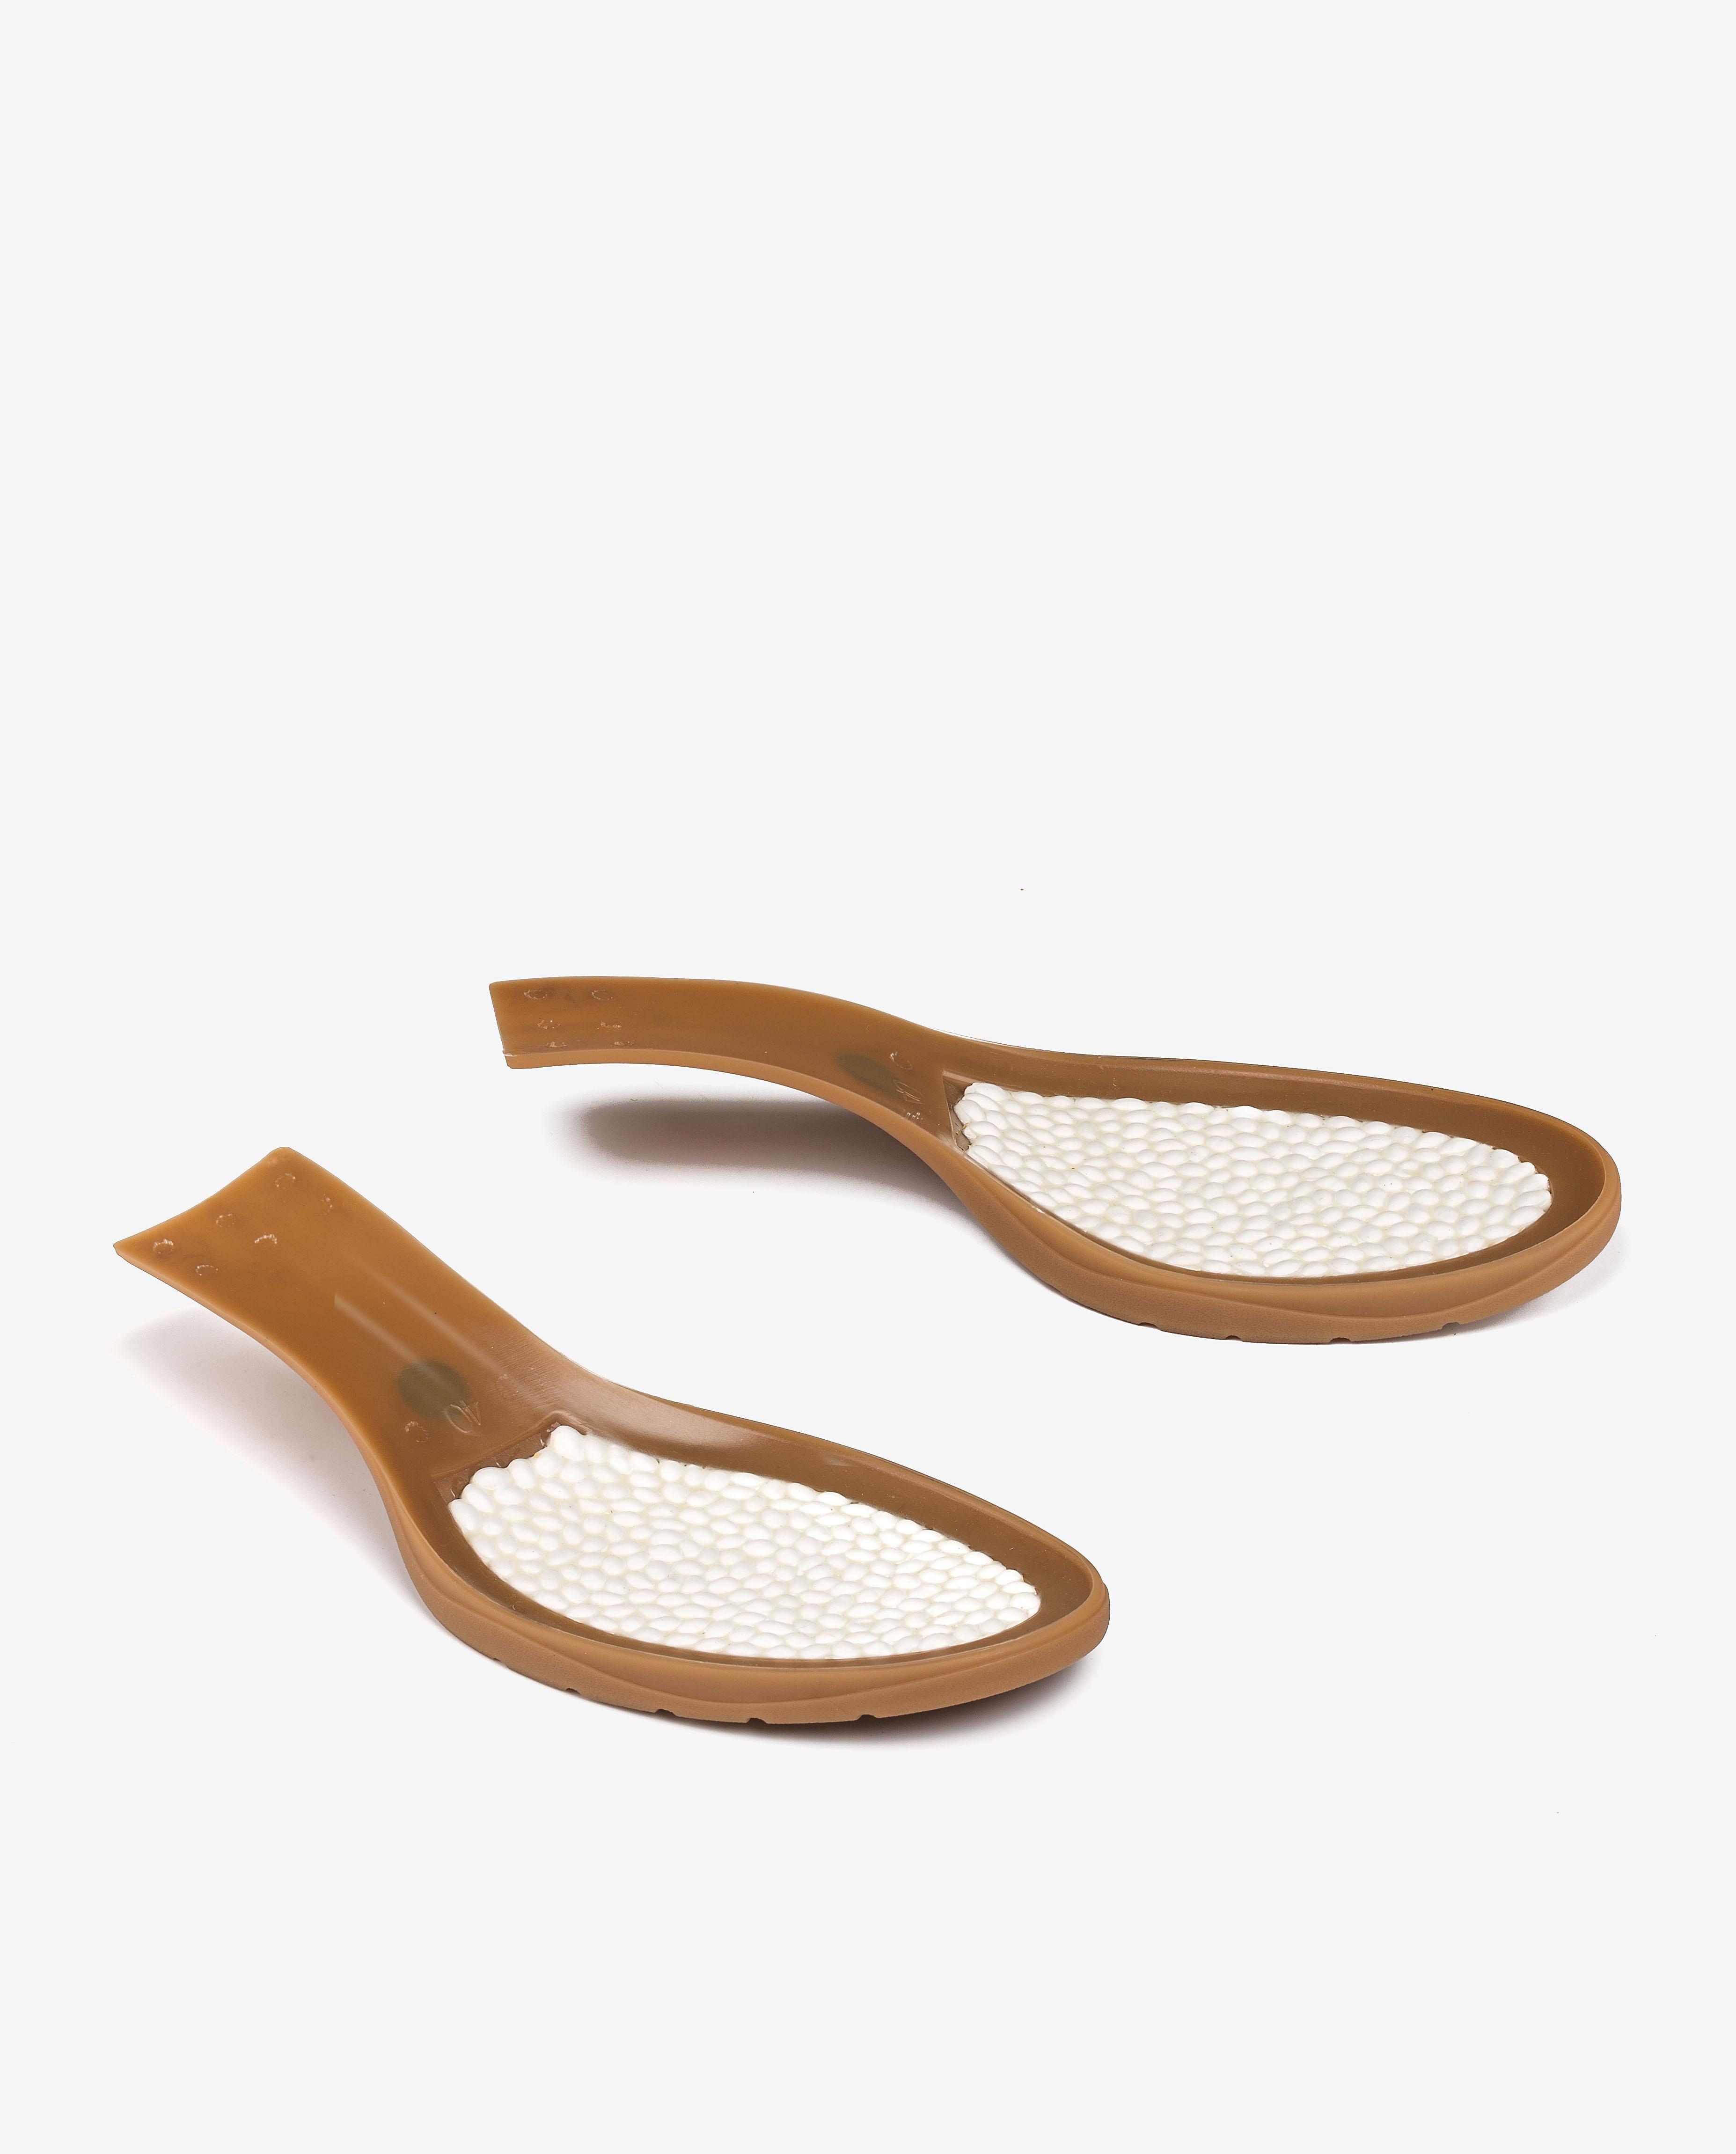 UNISA Sandalia oro claro tacón efecto madera GODOY_LMT platino